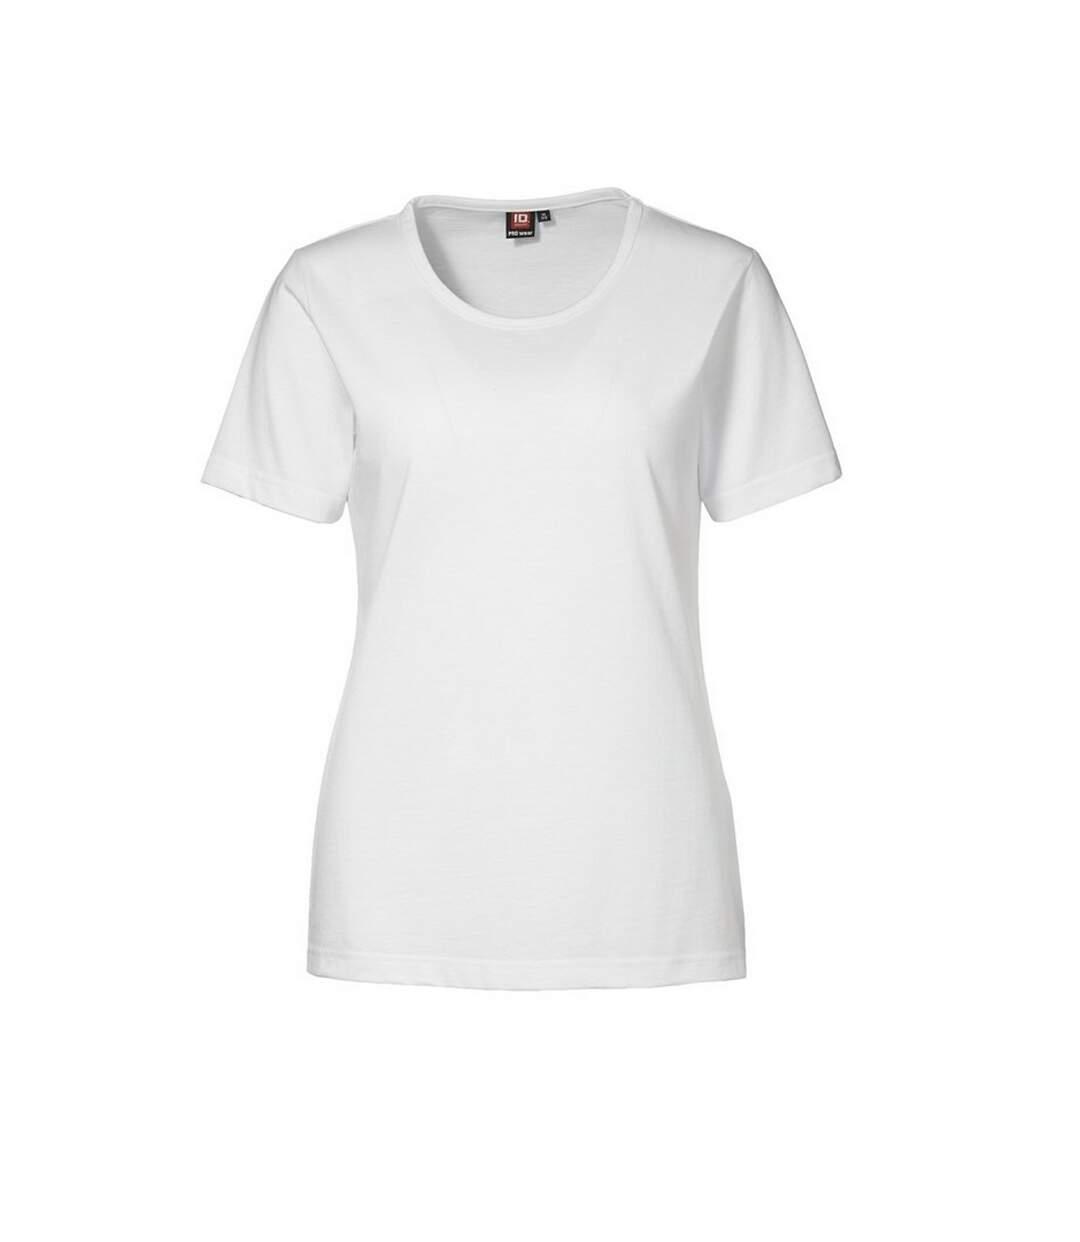 Id - T-Shirt À Manches Courtes - Femme (Blanc) - UTID171